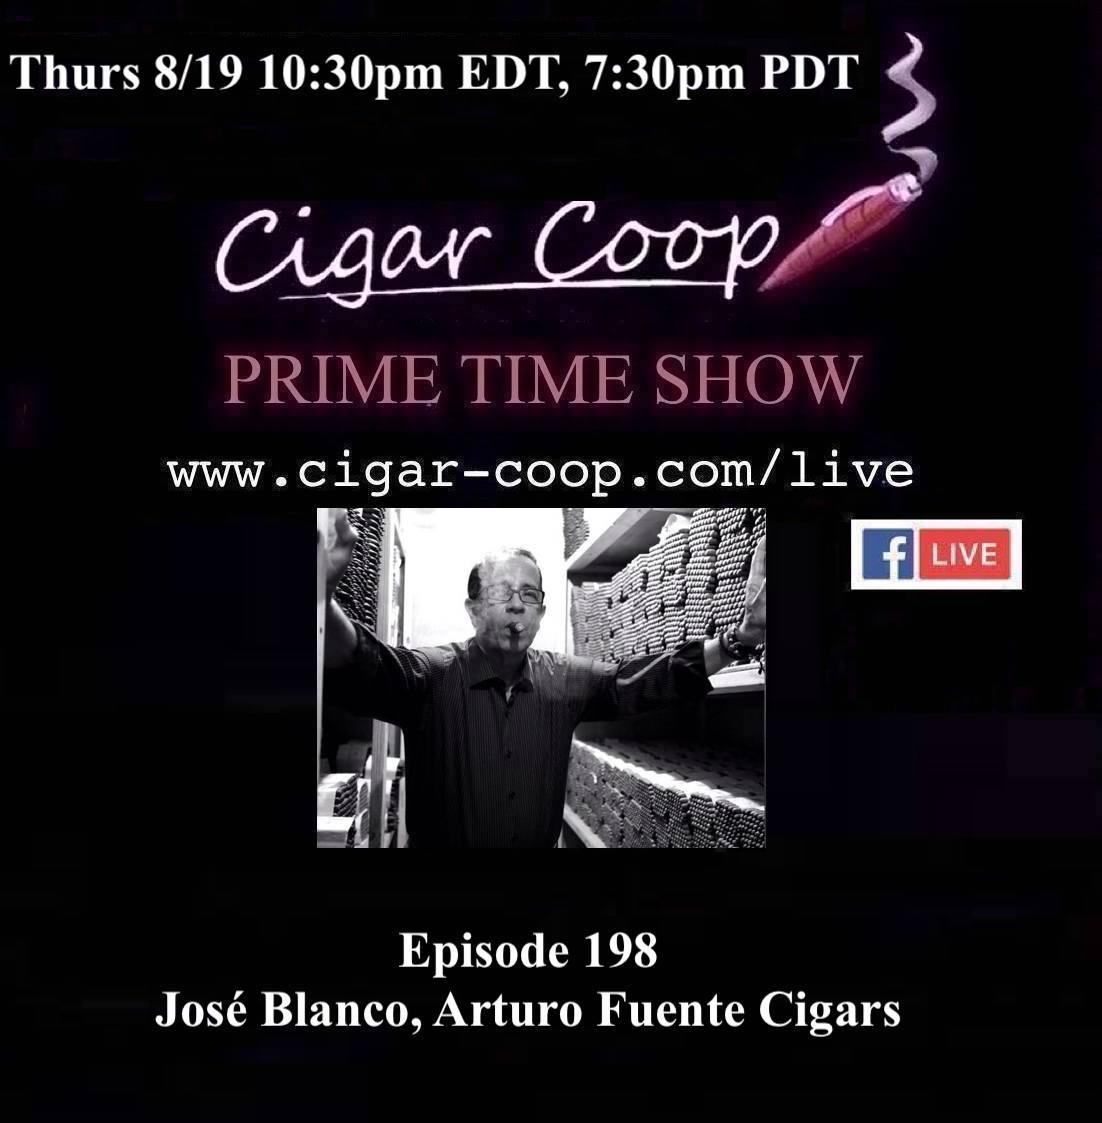 Announcement: Prime Time Episode 198 – José Blanco, Arturo Fuente Cigars